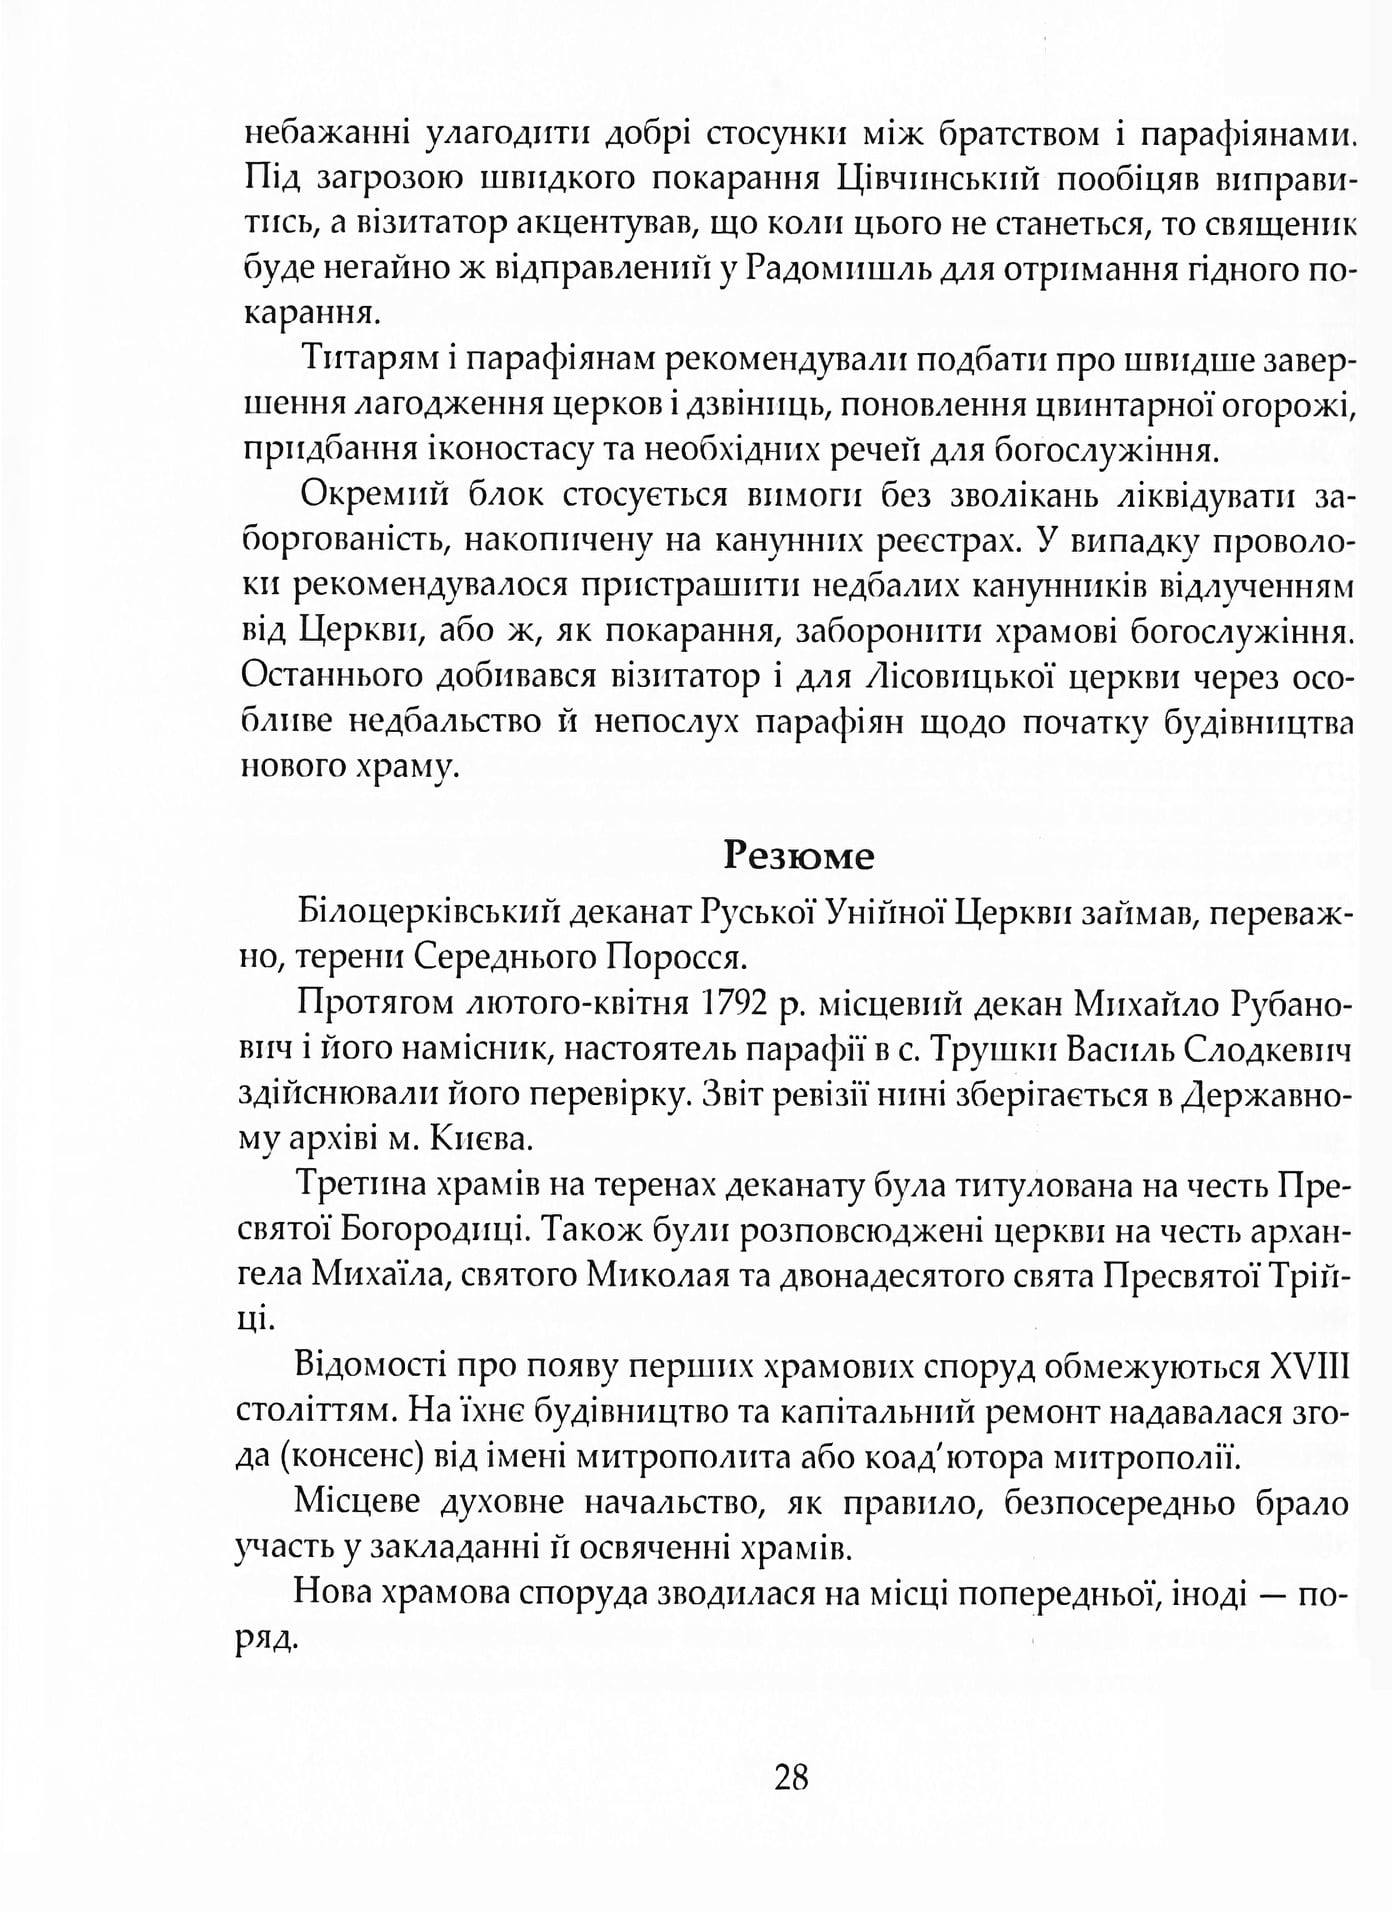 https://i7.imageban.ru/out/2021/09/23/e6cf390f4d52f363f3bc9f270f991463.jpg